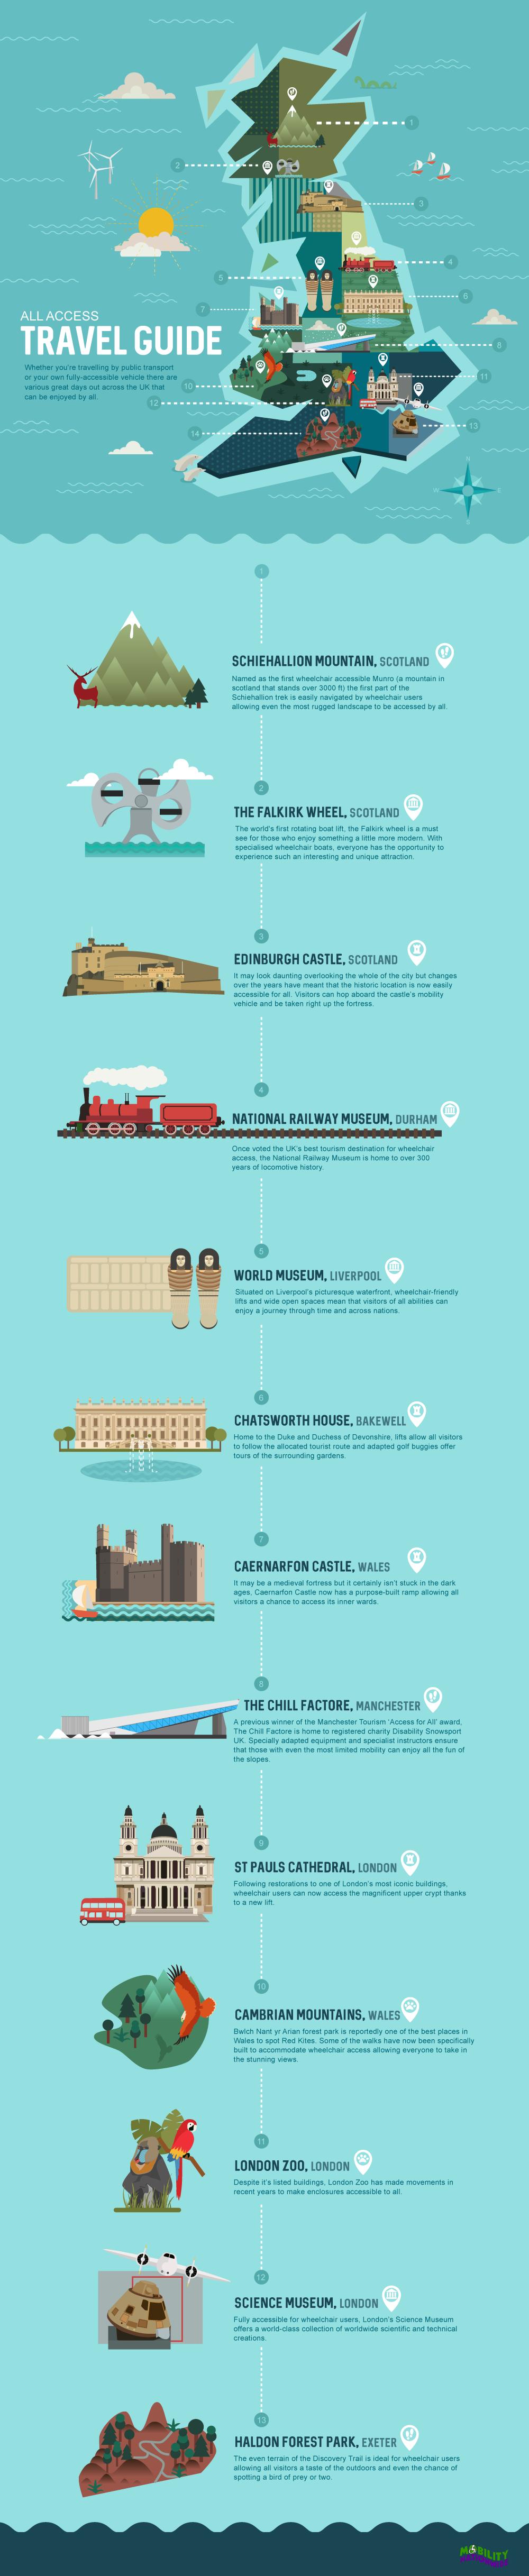 #TravelforAll Infographic